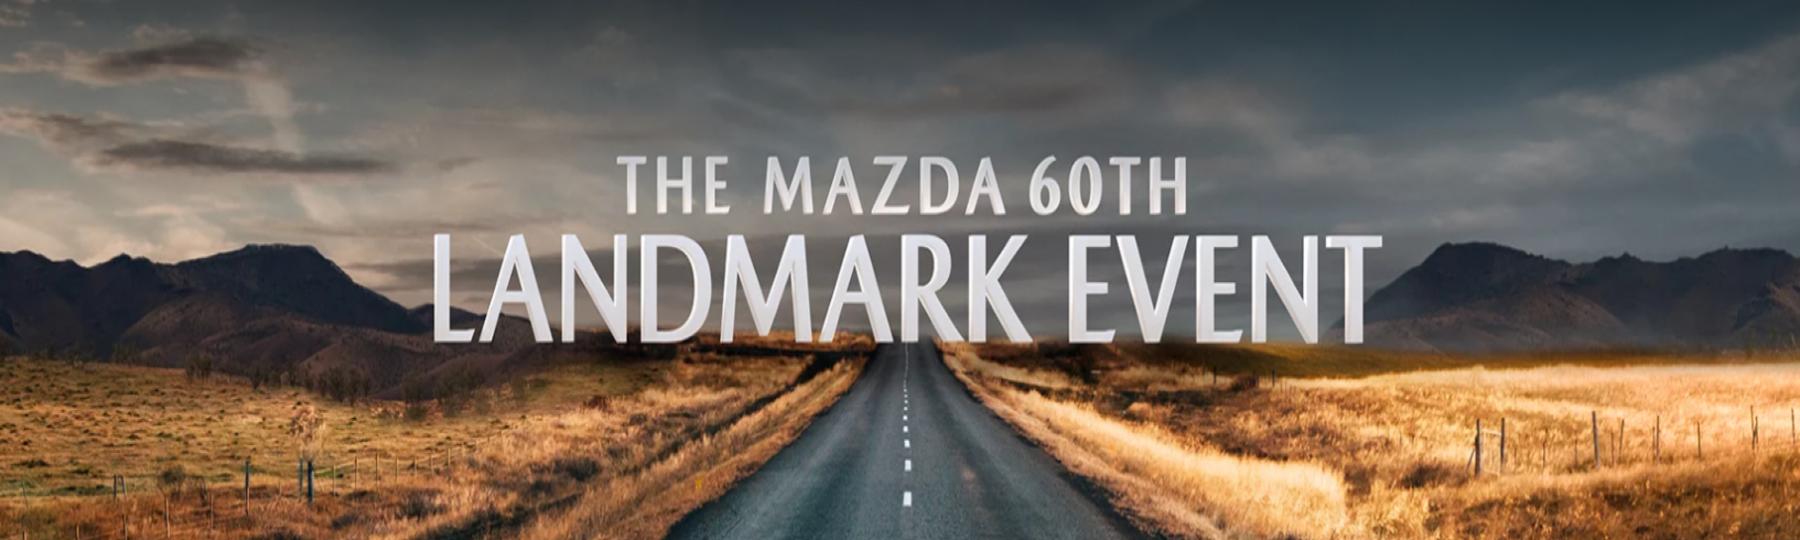 60th Landmark Event